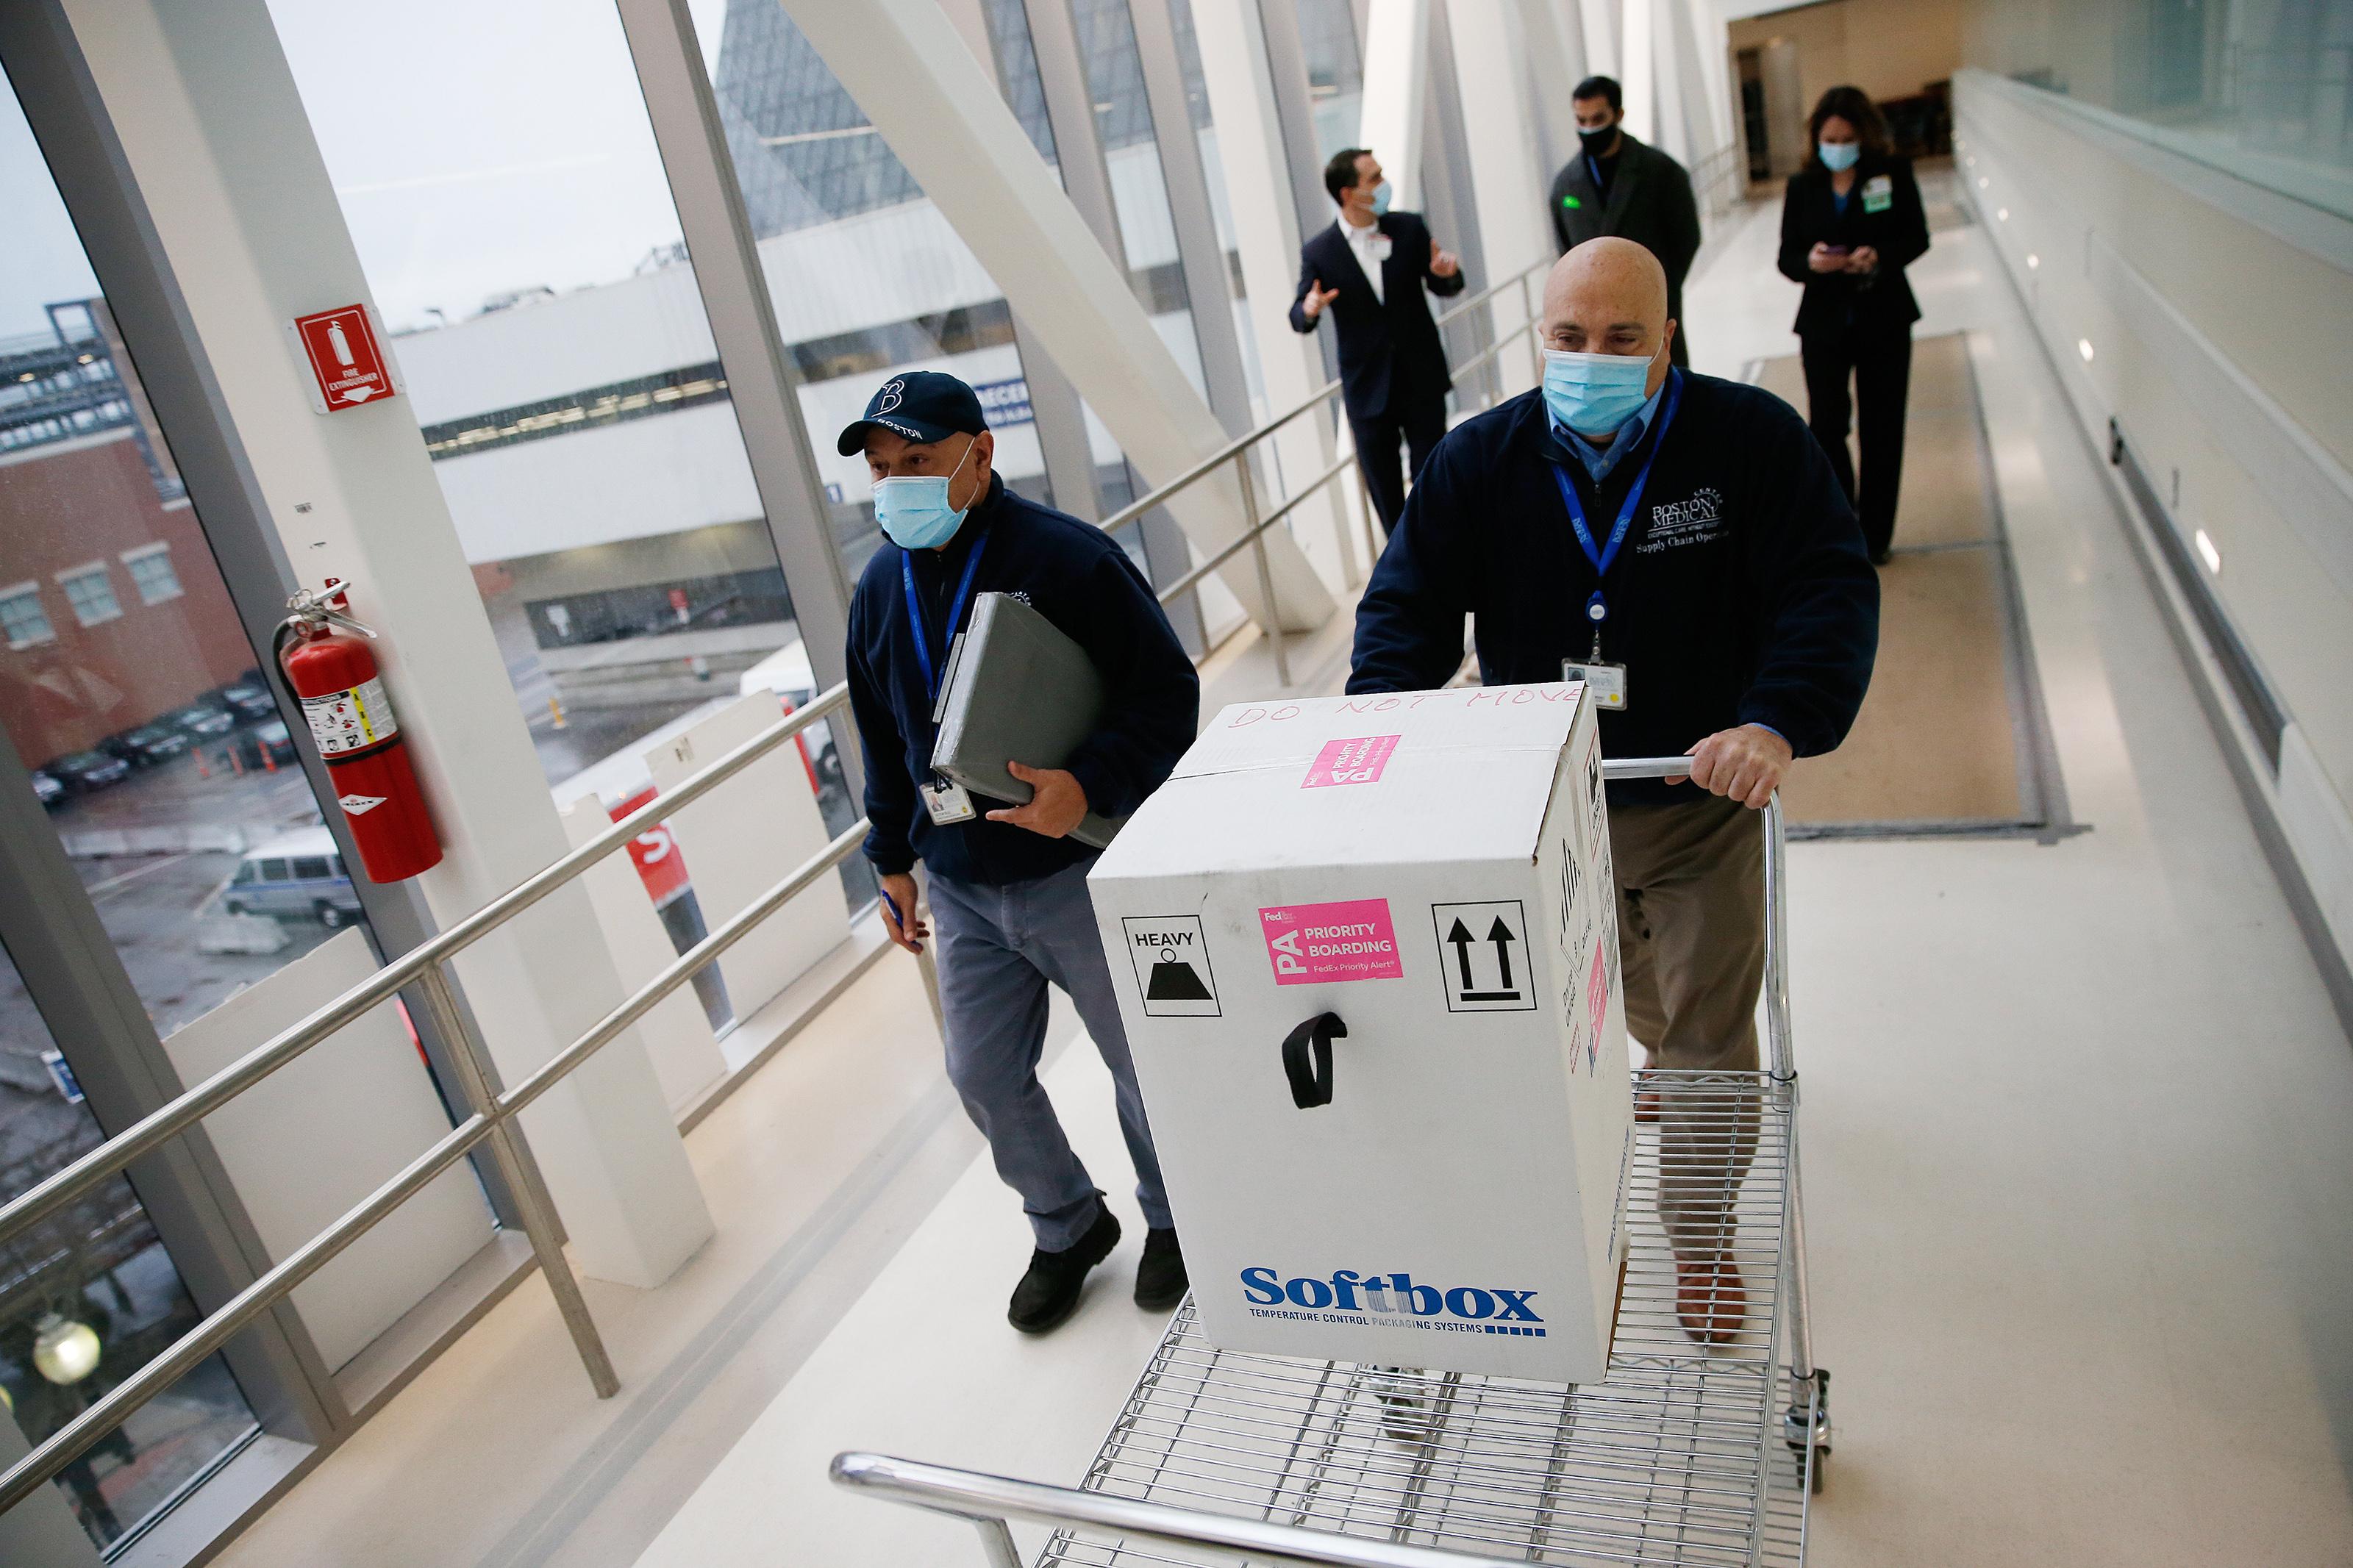 Boston Medical Center Accepts 1,950 Doses of Pfizers COVID-19 Caccine